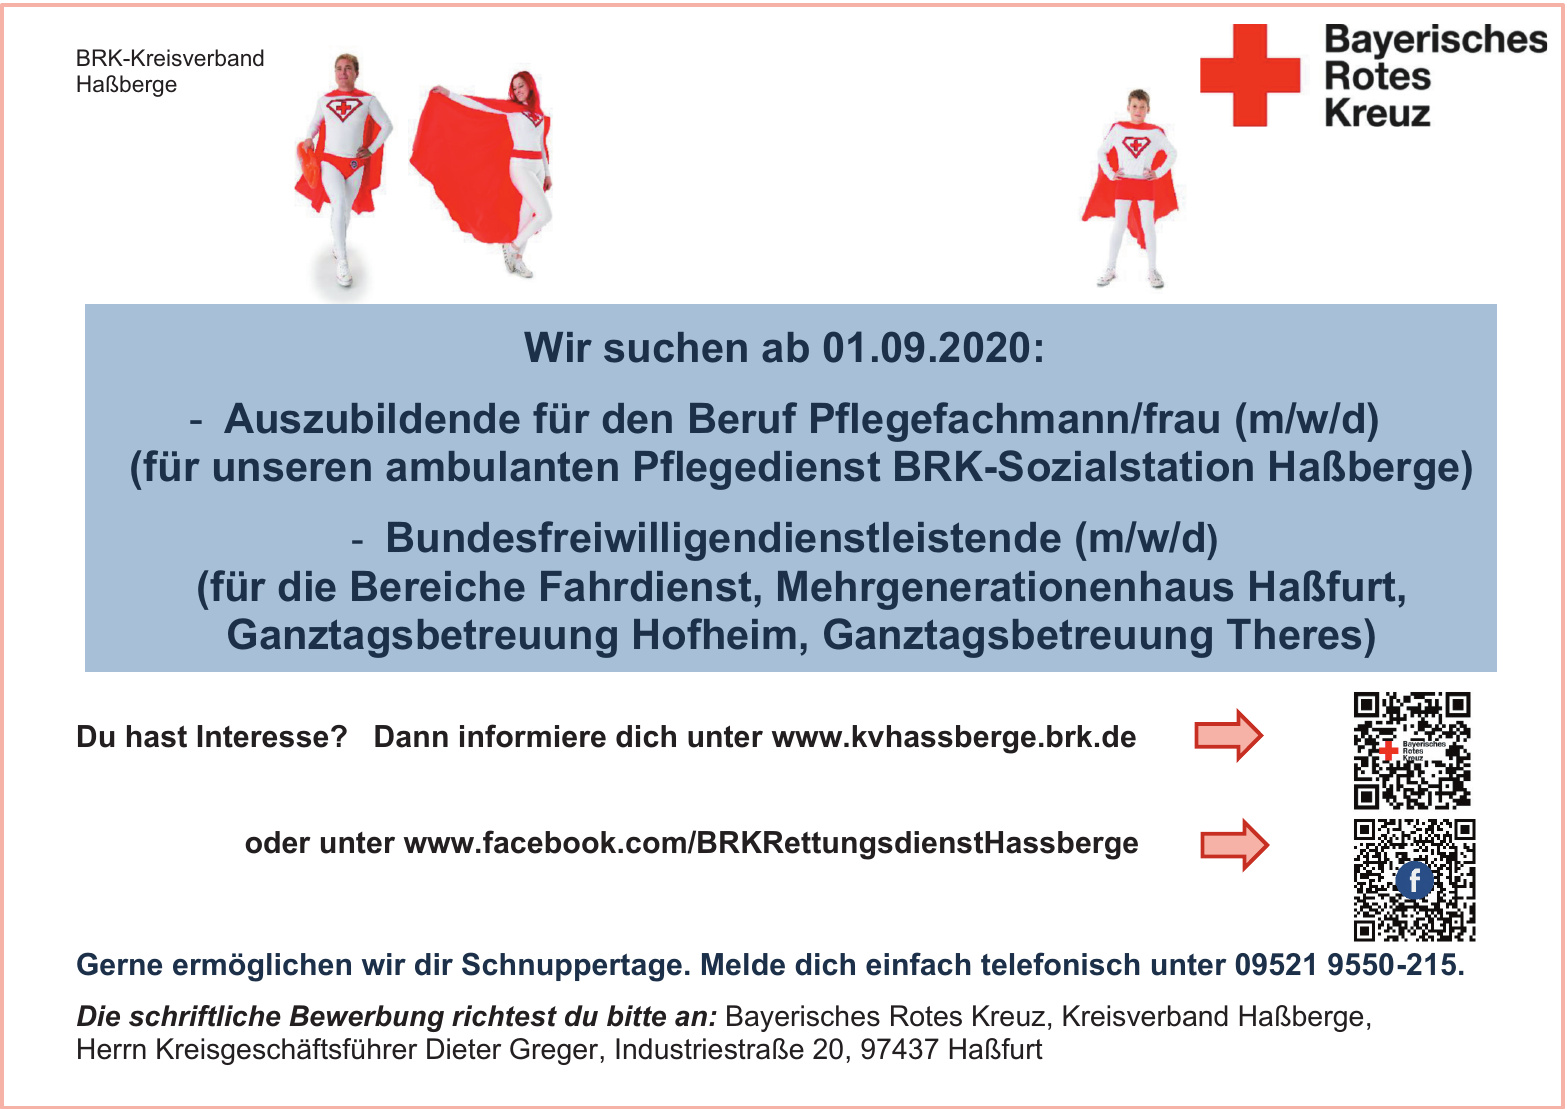 BRK-Kreisverband Haßberge